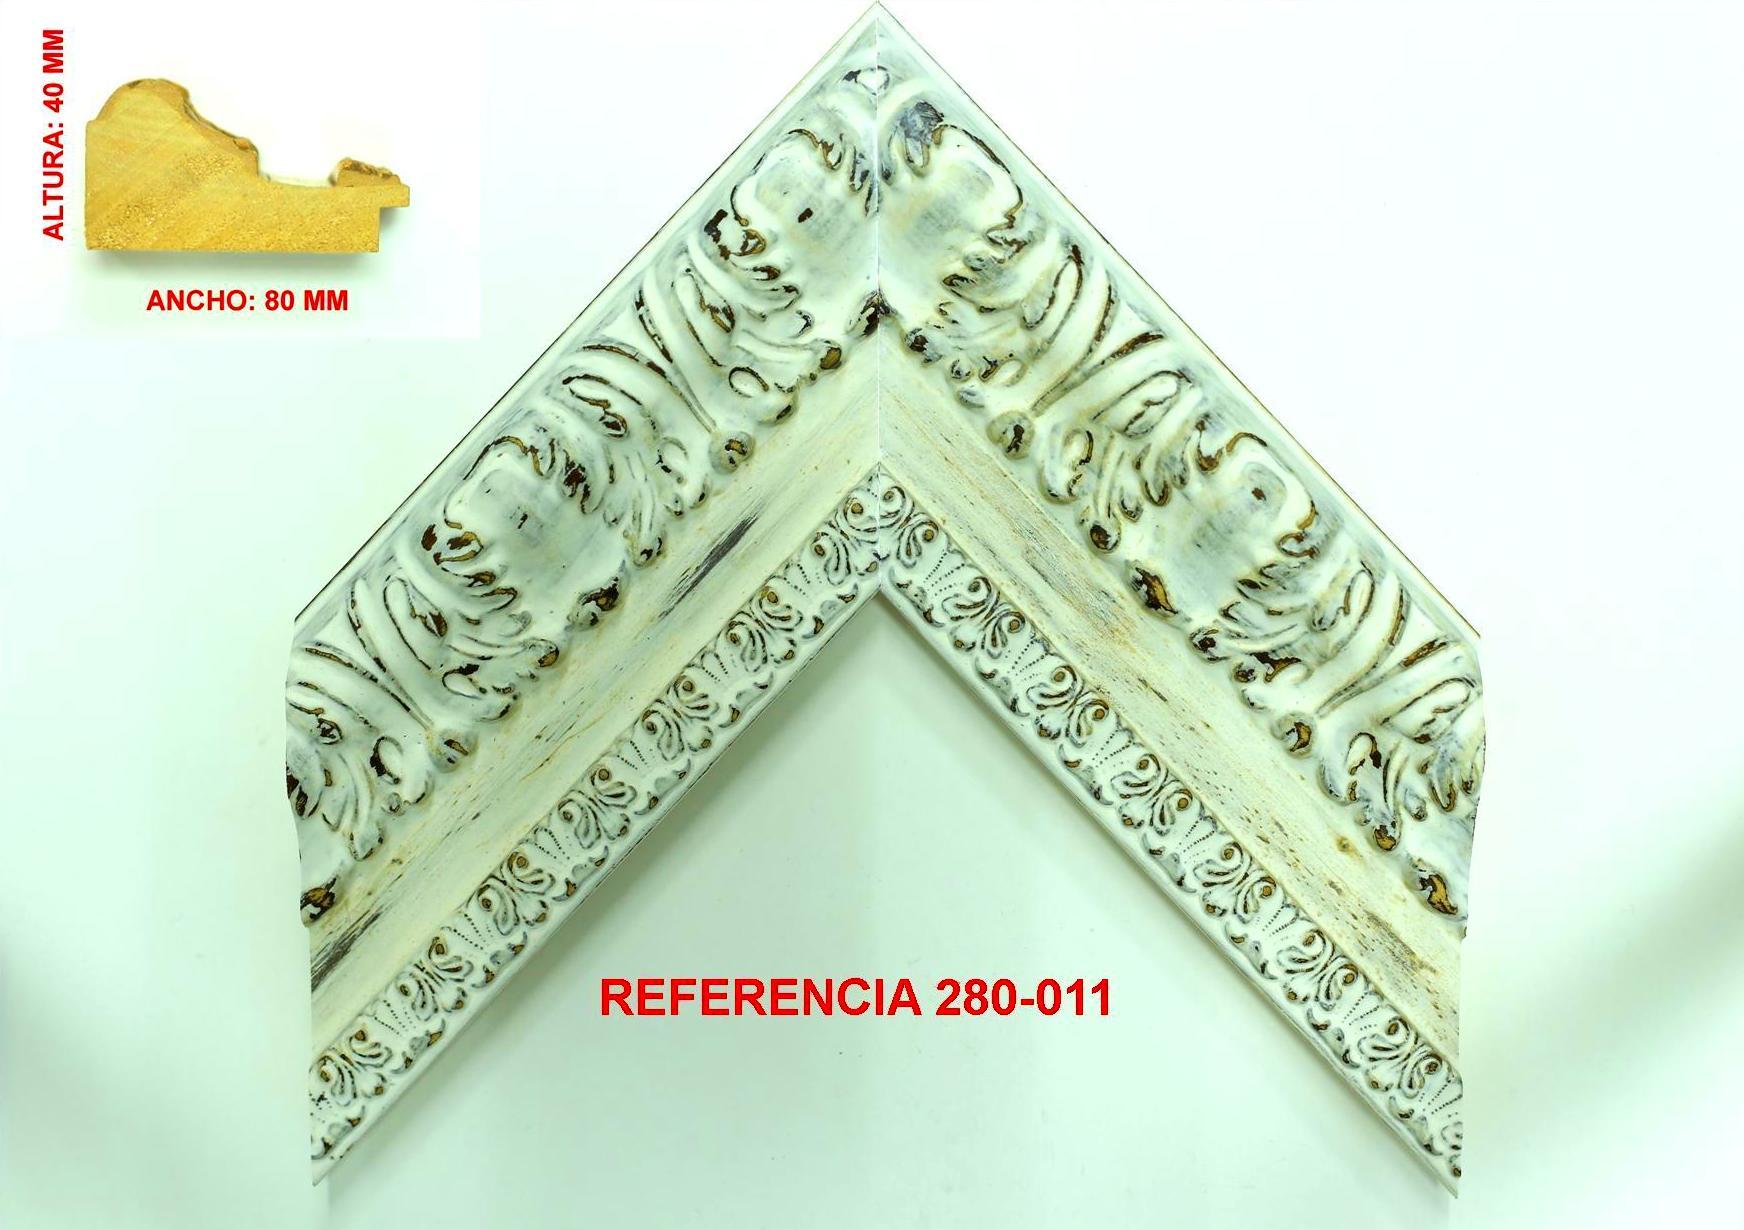 REF 280-011: Muestrario of Moldusevilla